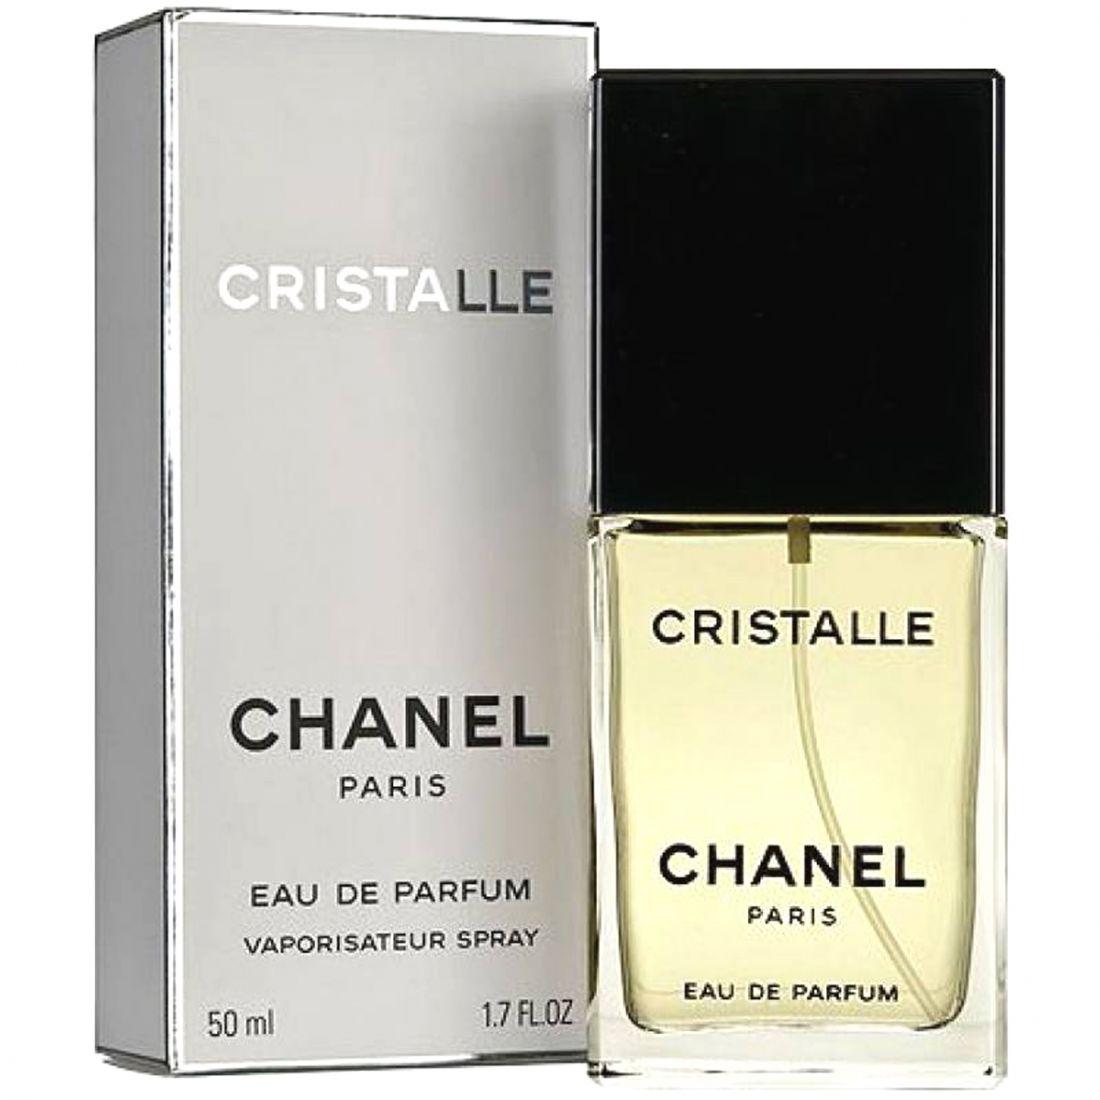 Chanel - Cristalle Eau Verte, 50 ml